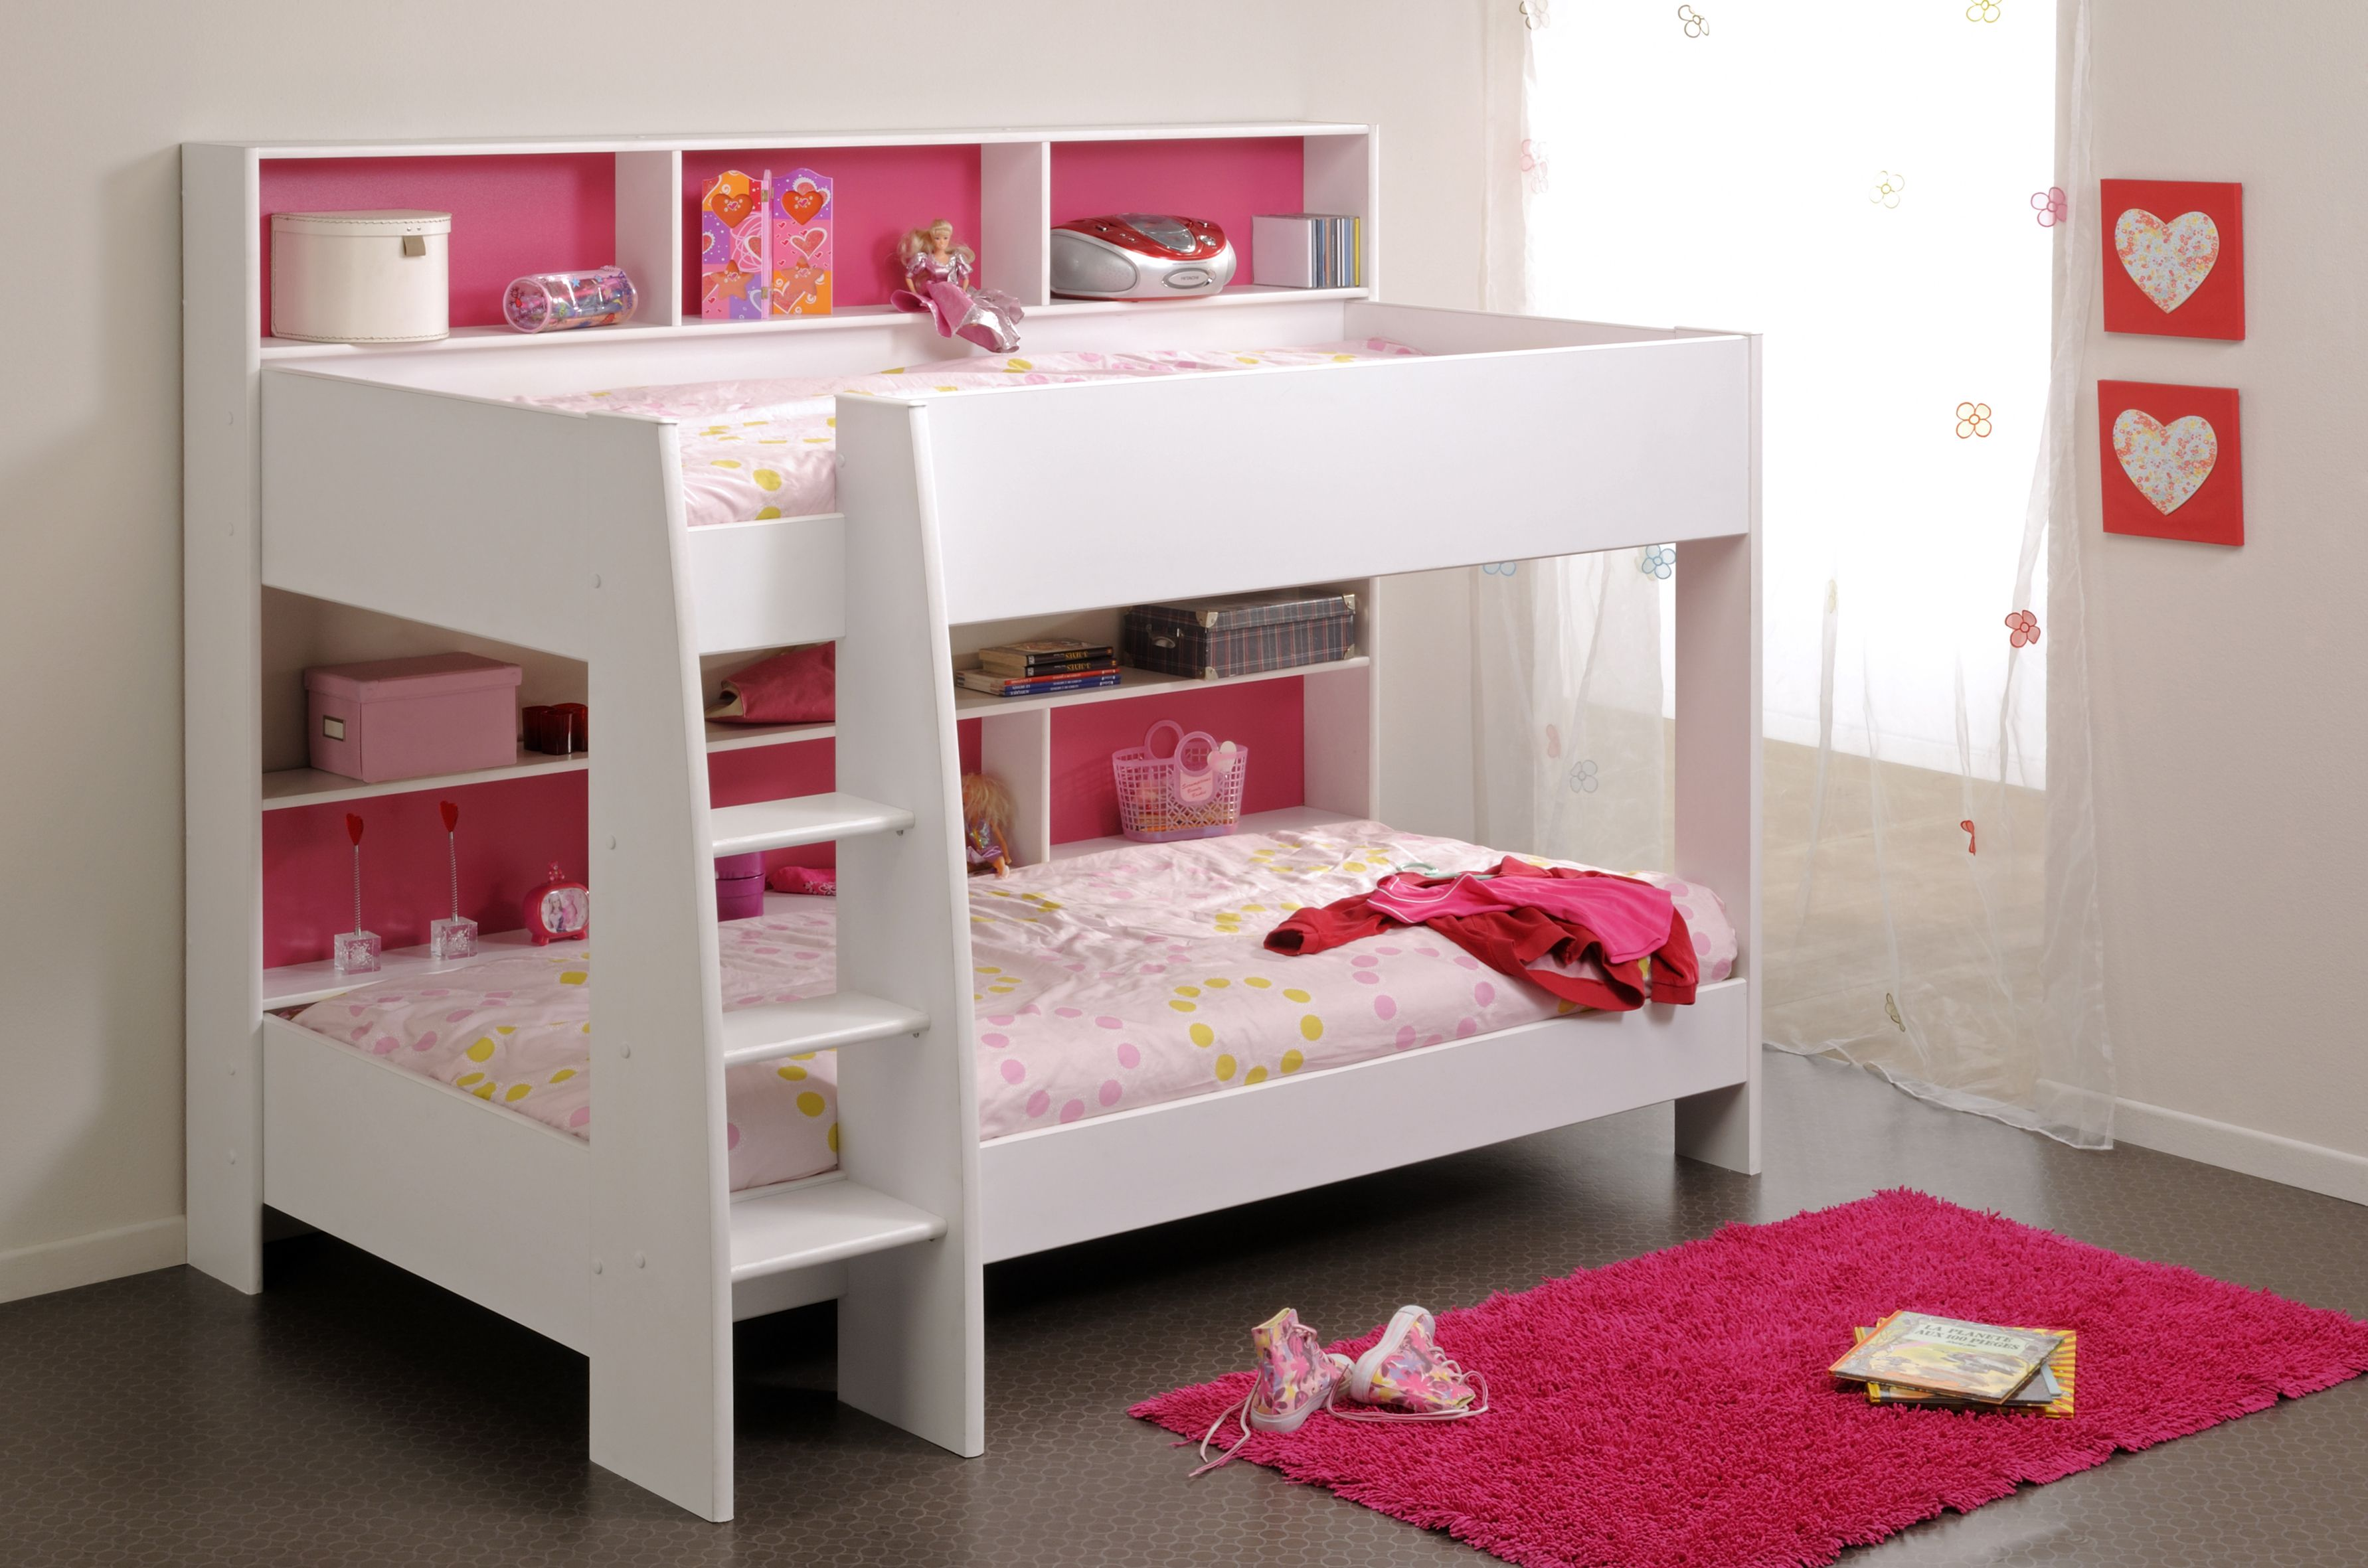 Space Function And Fun Bunk Beds Vs Twin Beds Tempat Tidur